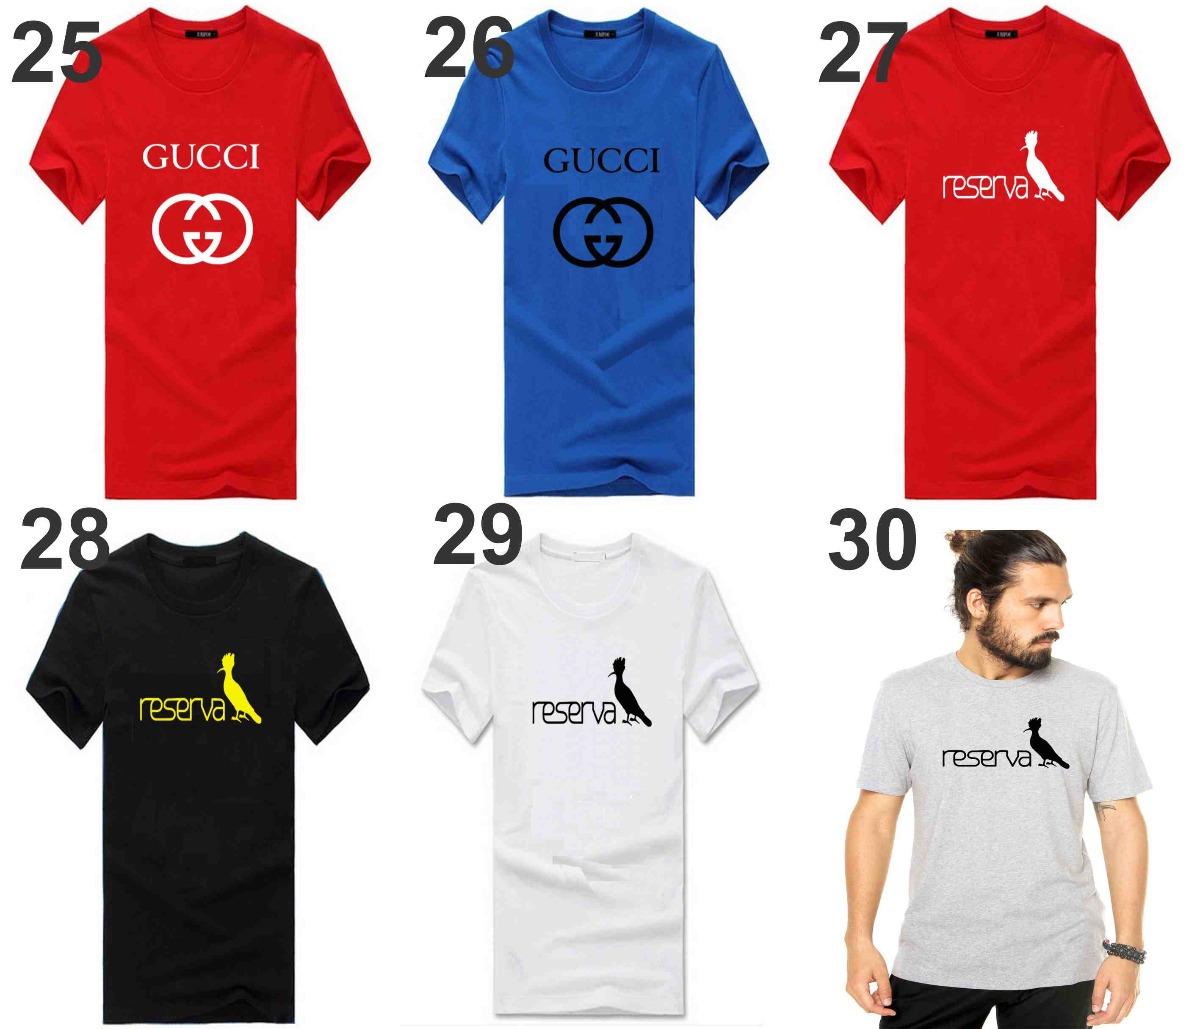 a795278dee Kit 10 Camisetas Camisas Masculinas Baratas Marcas Famosas - R  240 ...